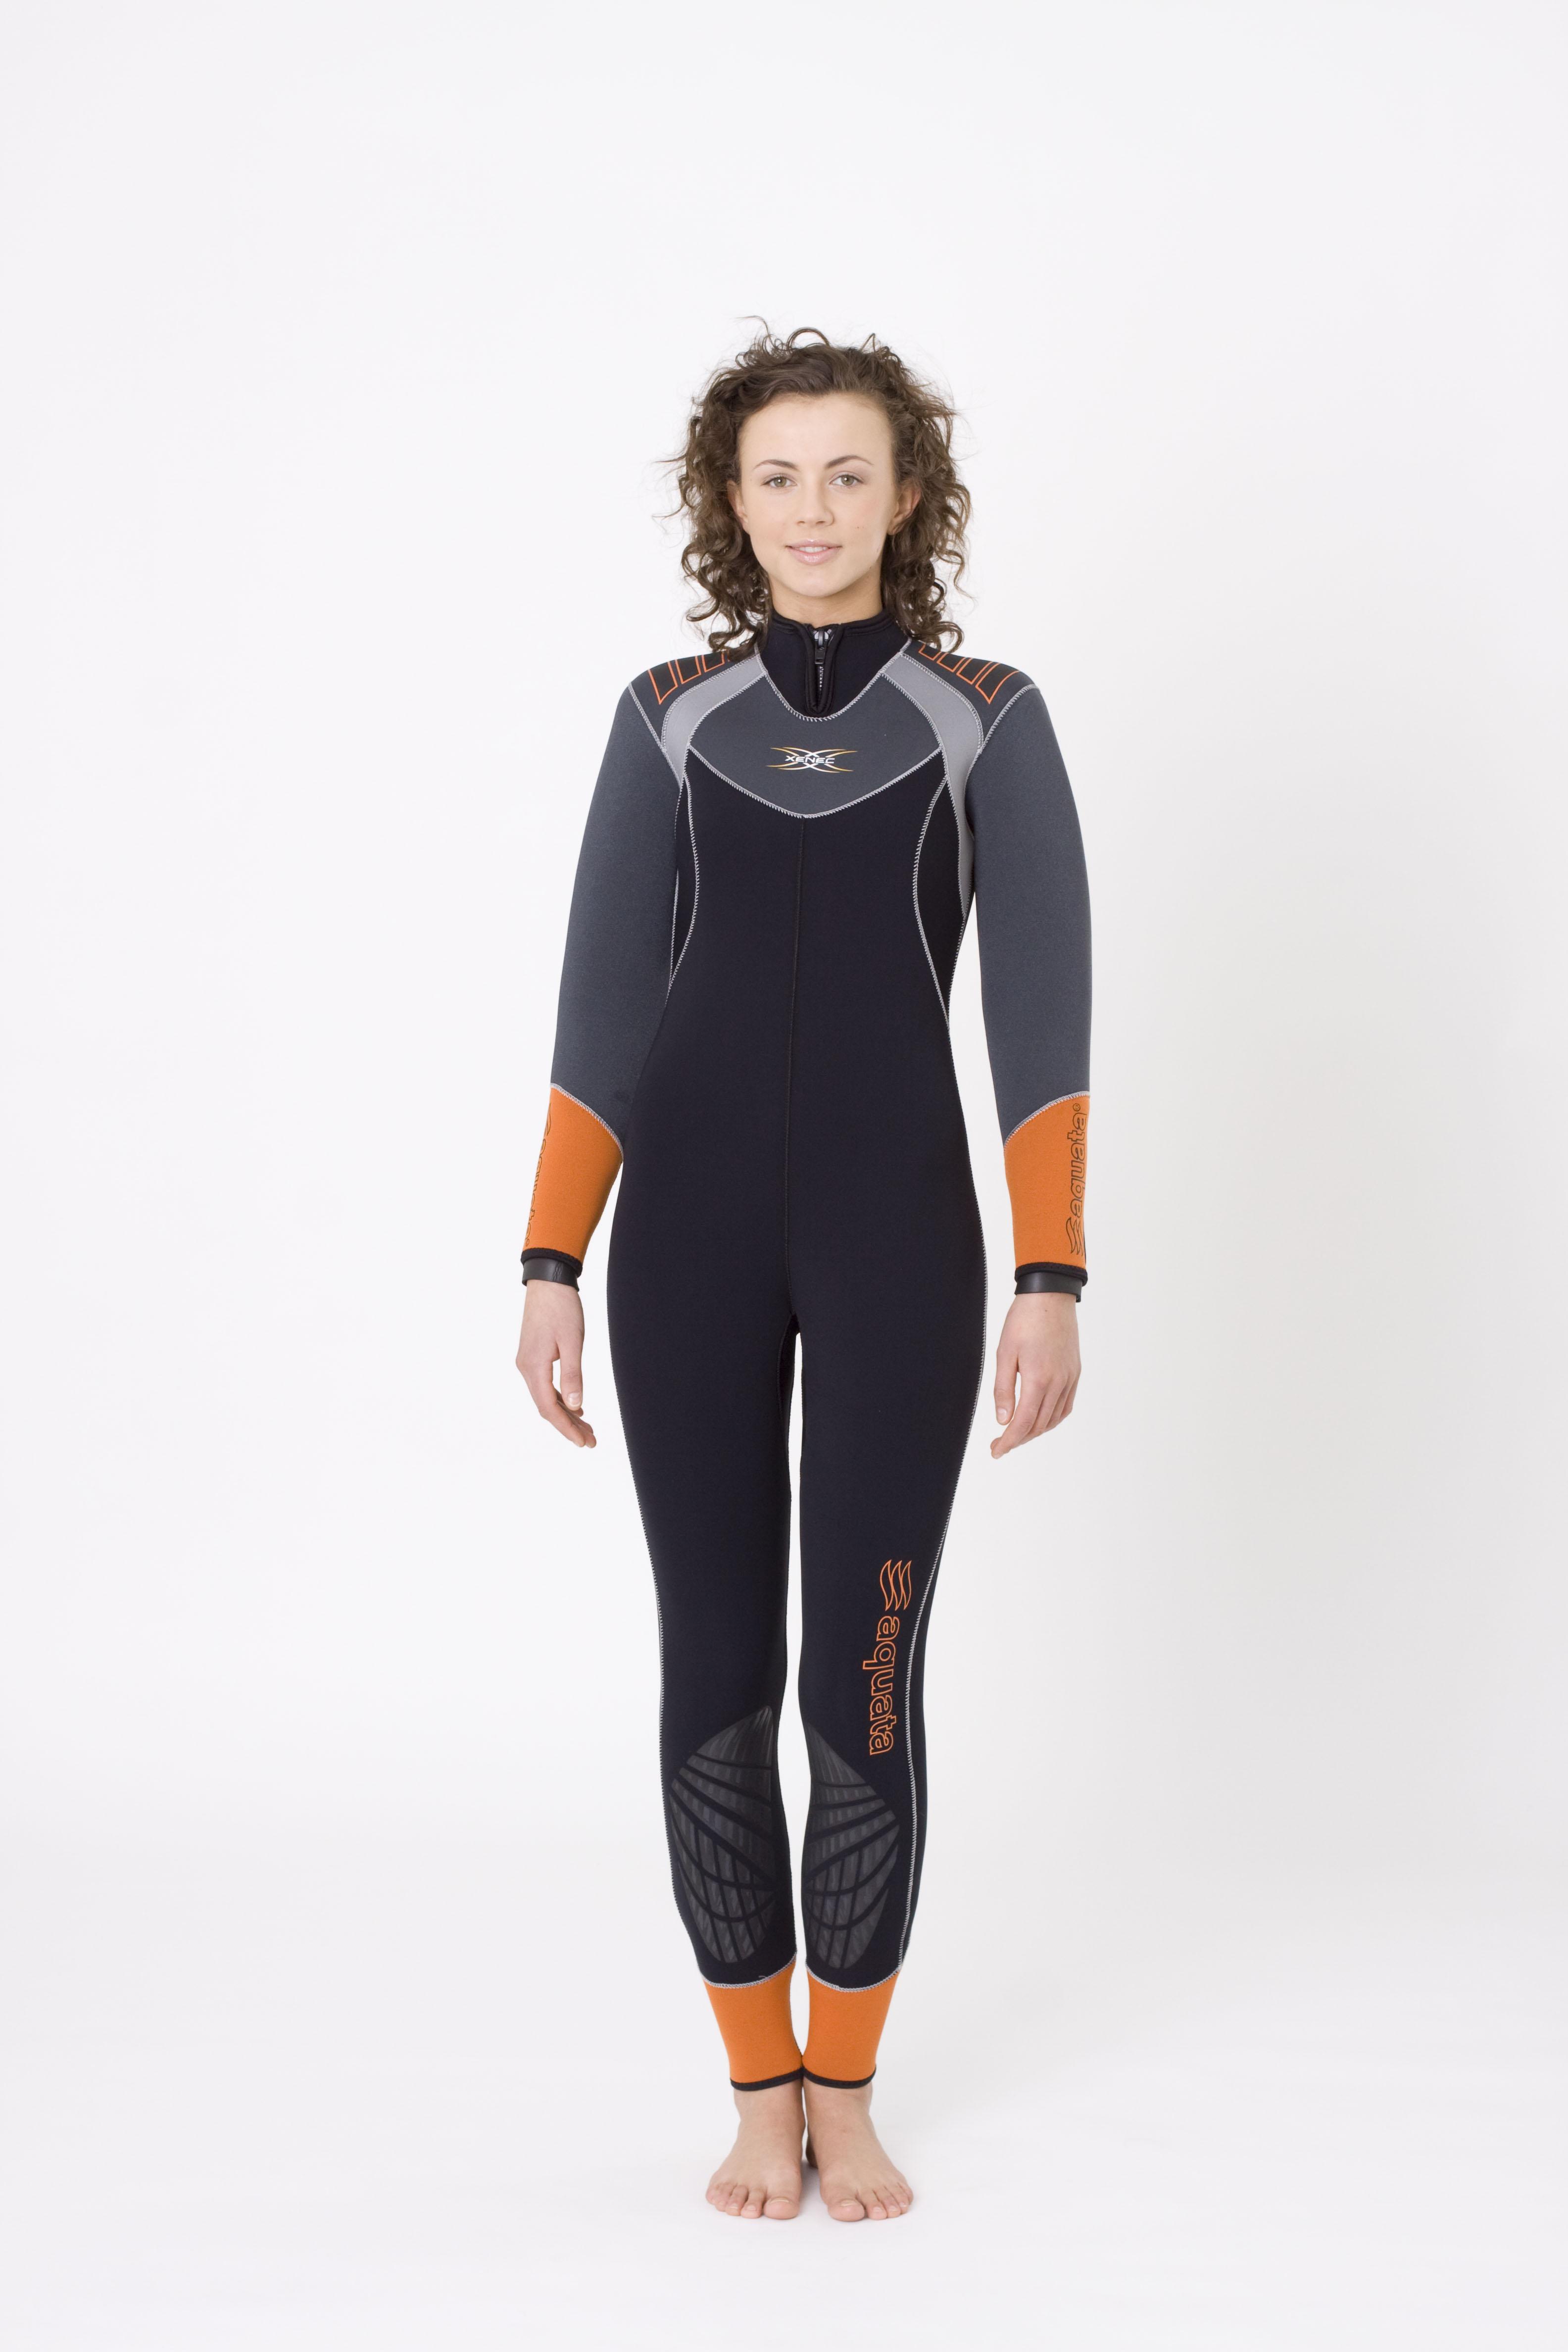 Halbtrocken Tauchanzug Overall     Damen  Xenec 09    aquata